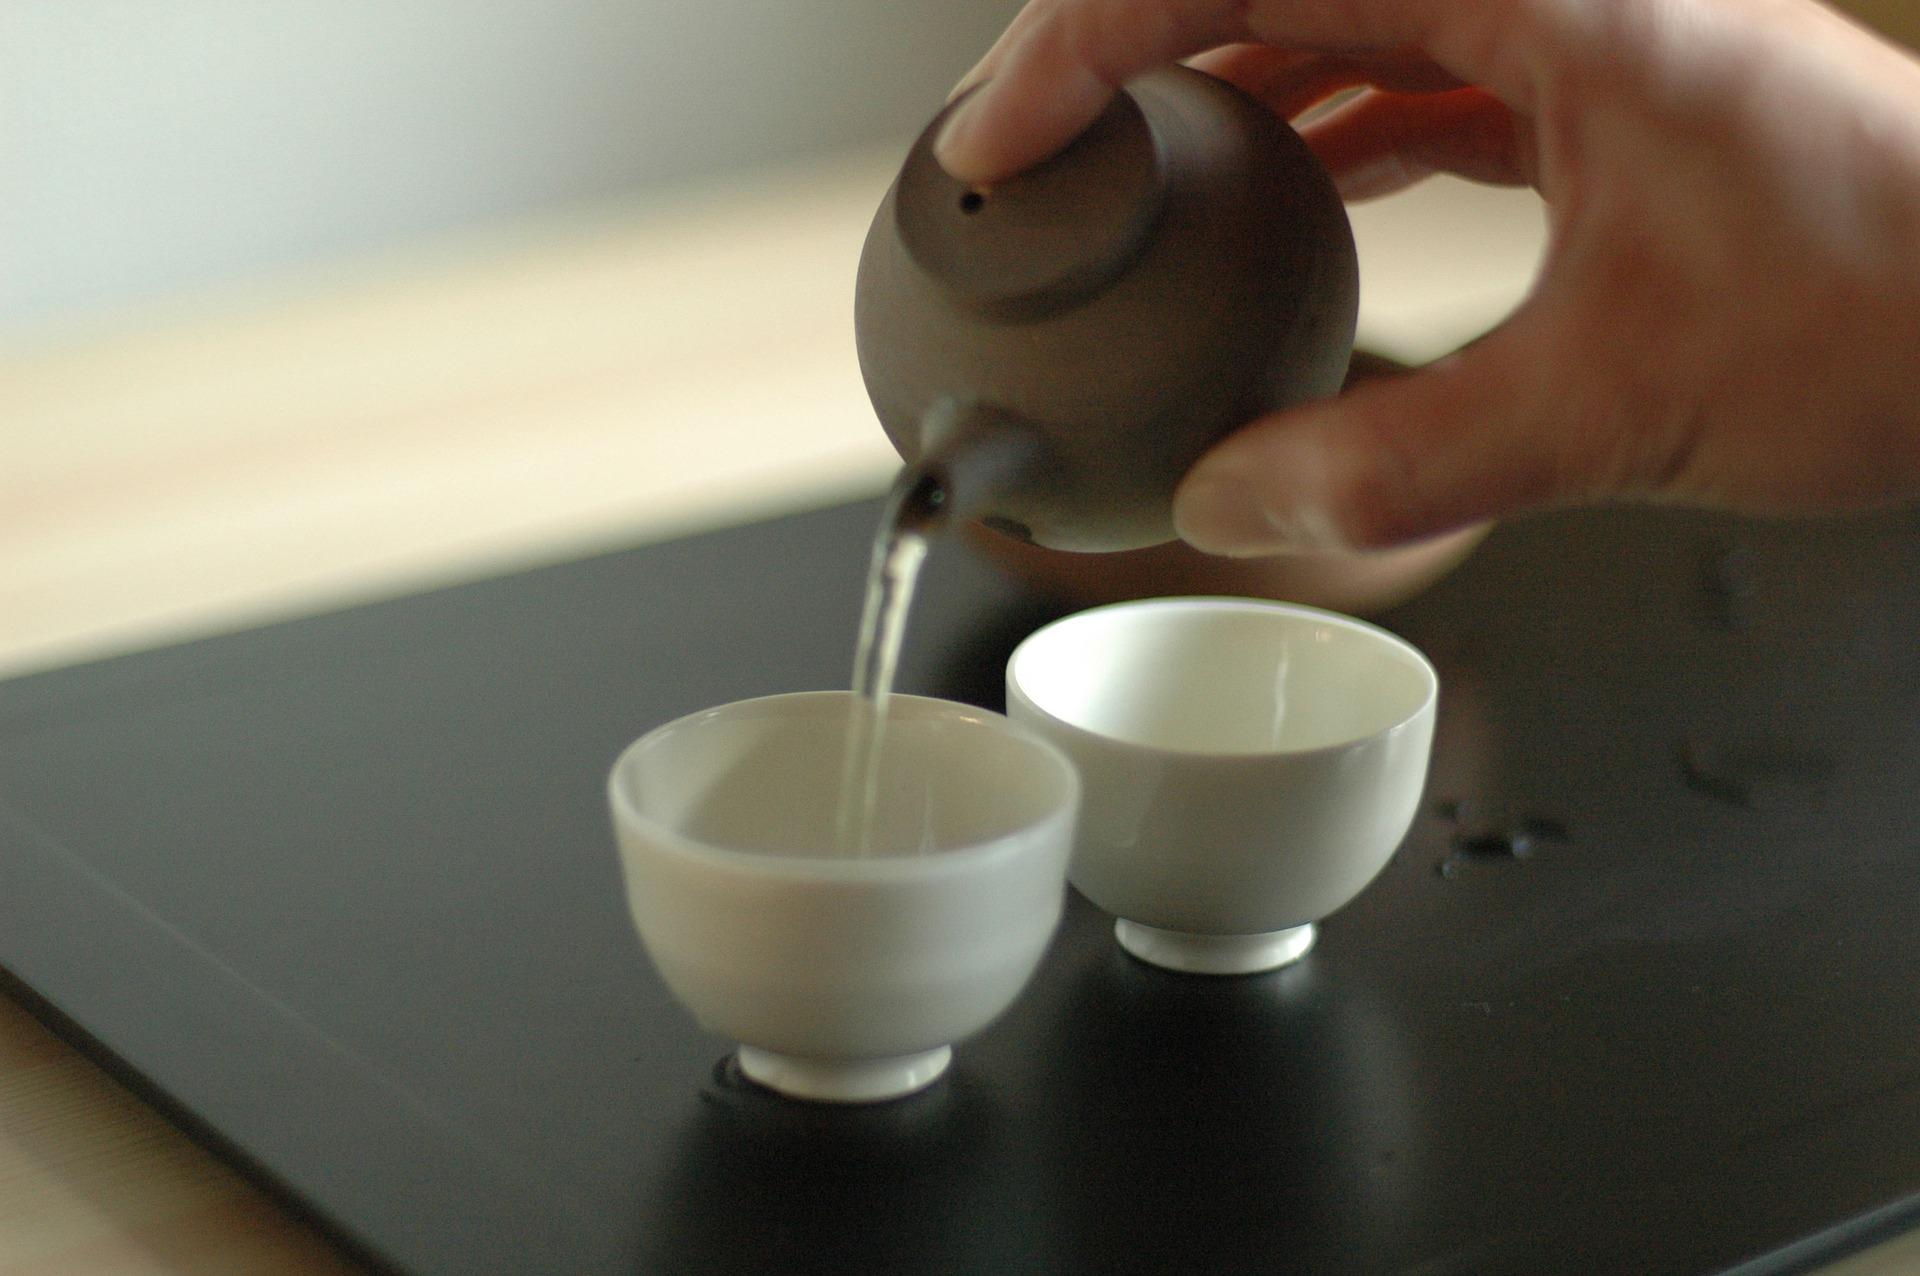 teiera giapponese con tazze